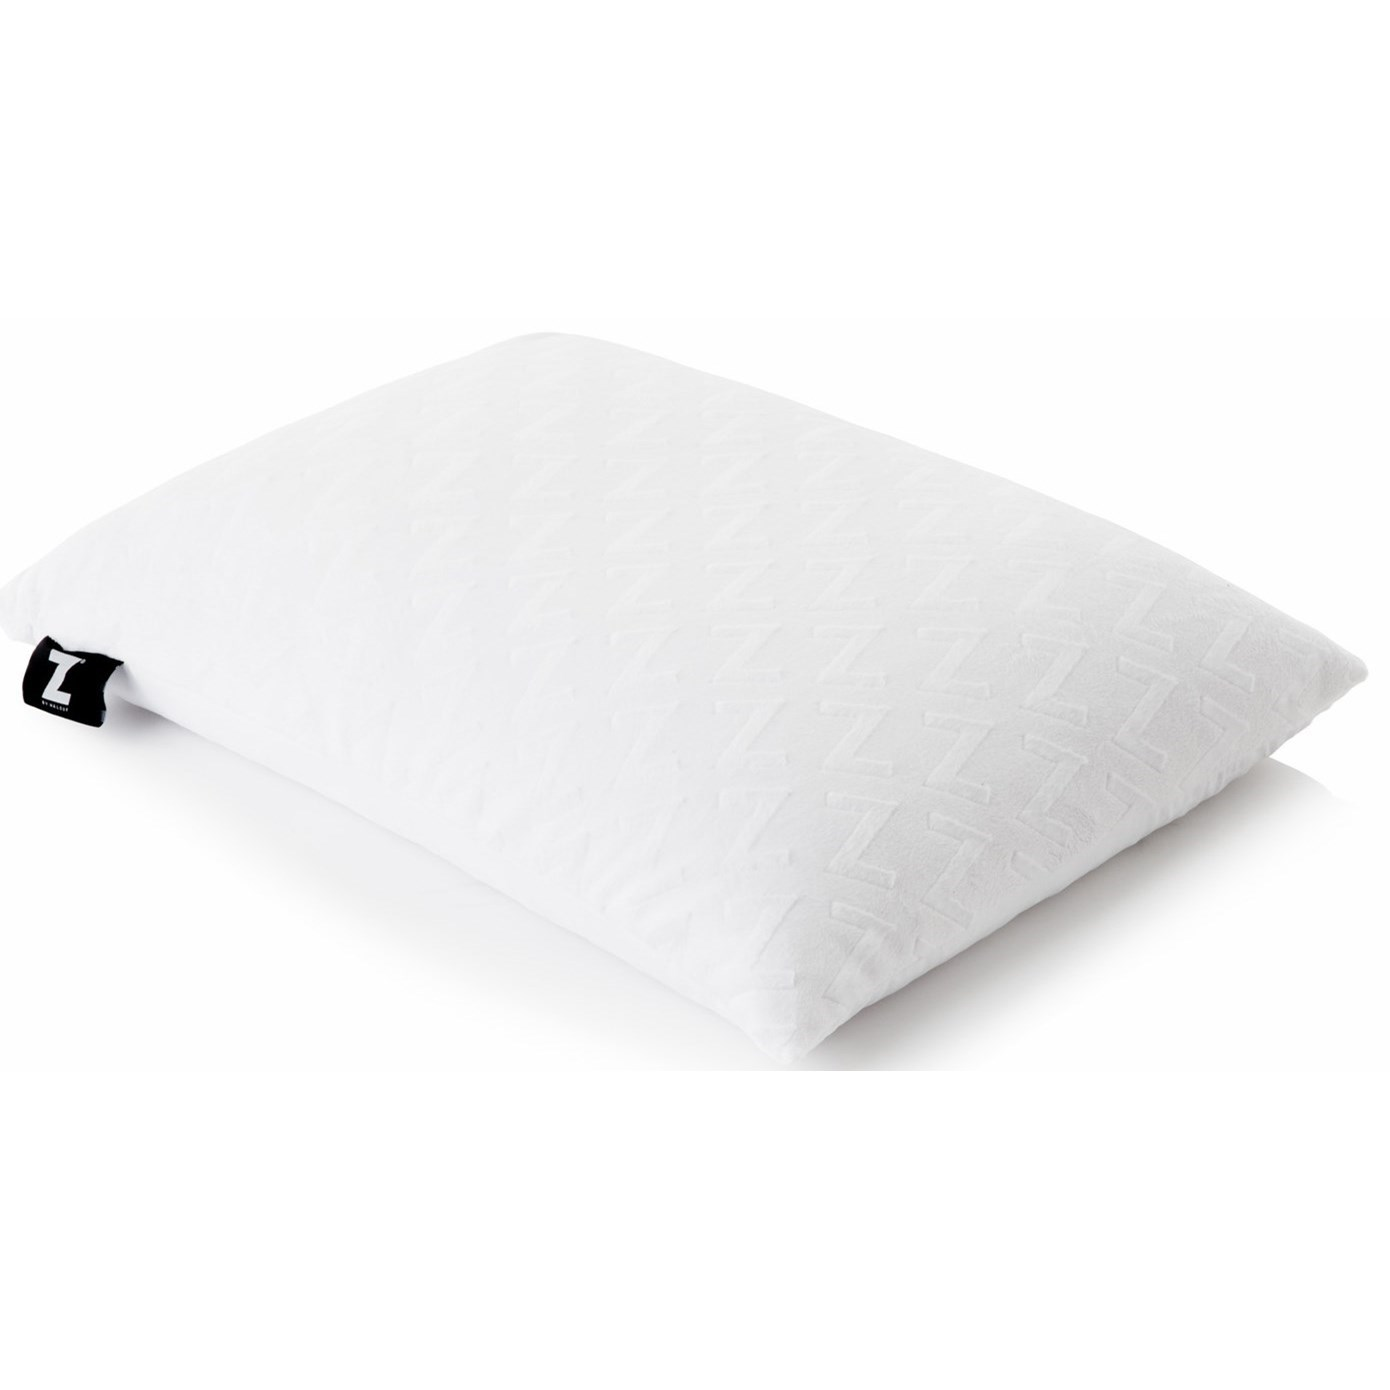 Malouf Shredded Latex Queen Shredded Latex Pillow - Item Number: ZZQQ00SX